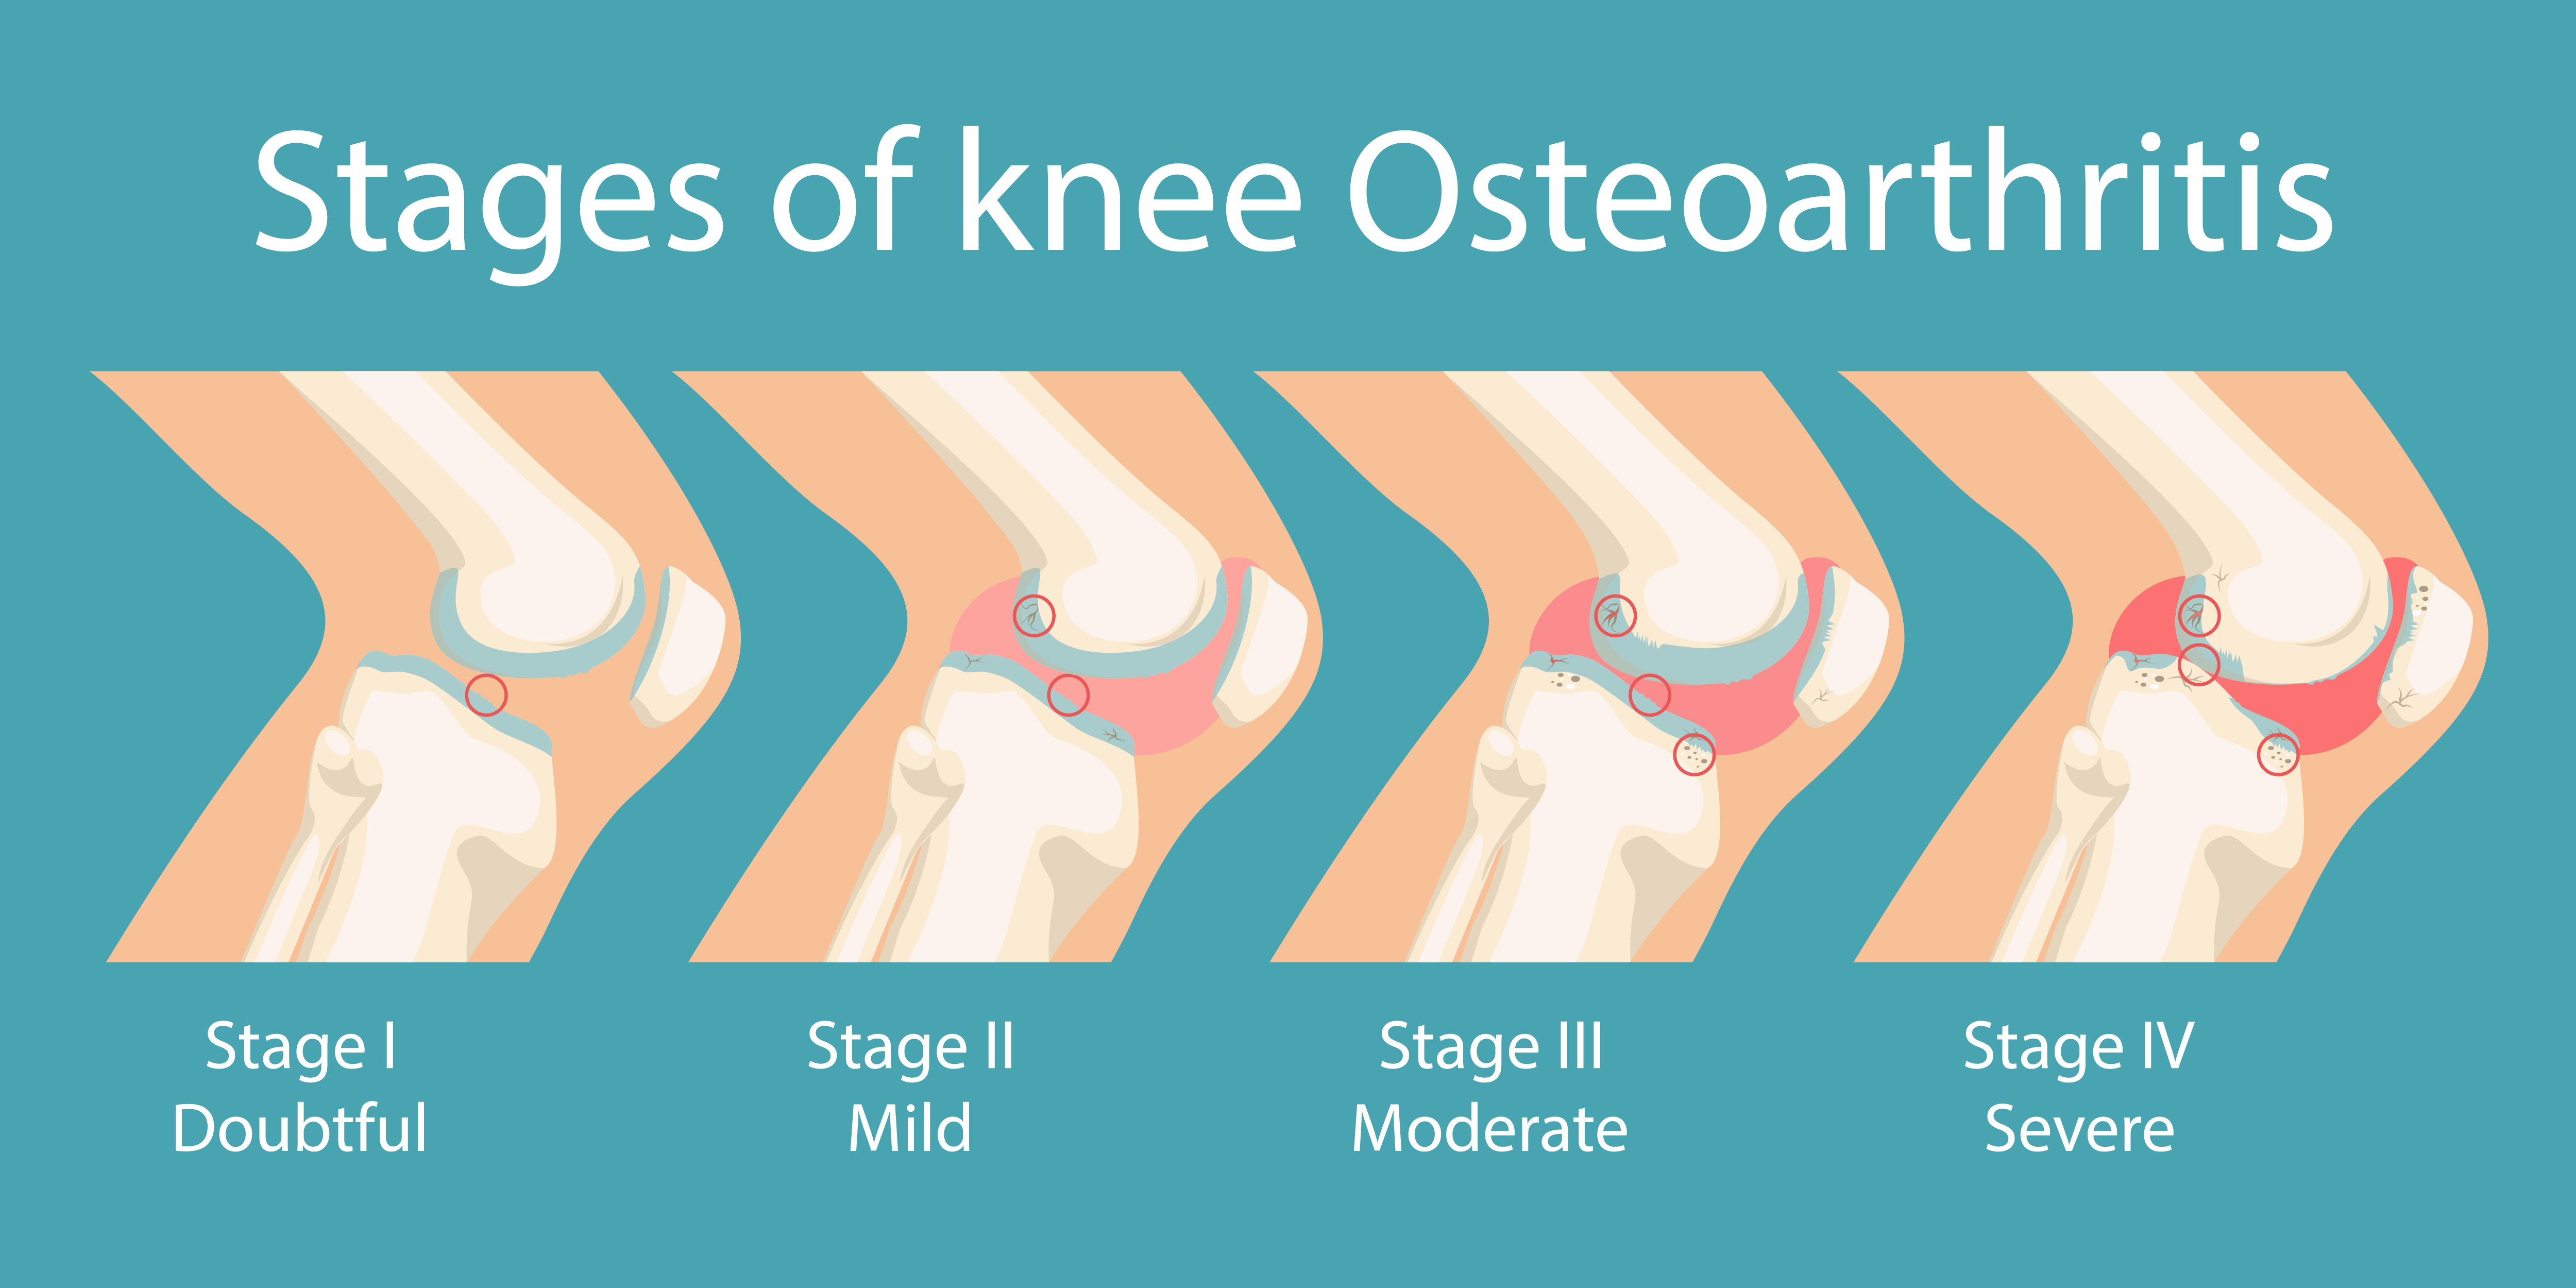 A visualization of osteoarthritis